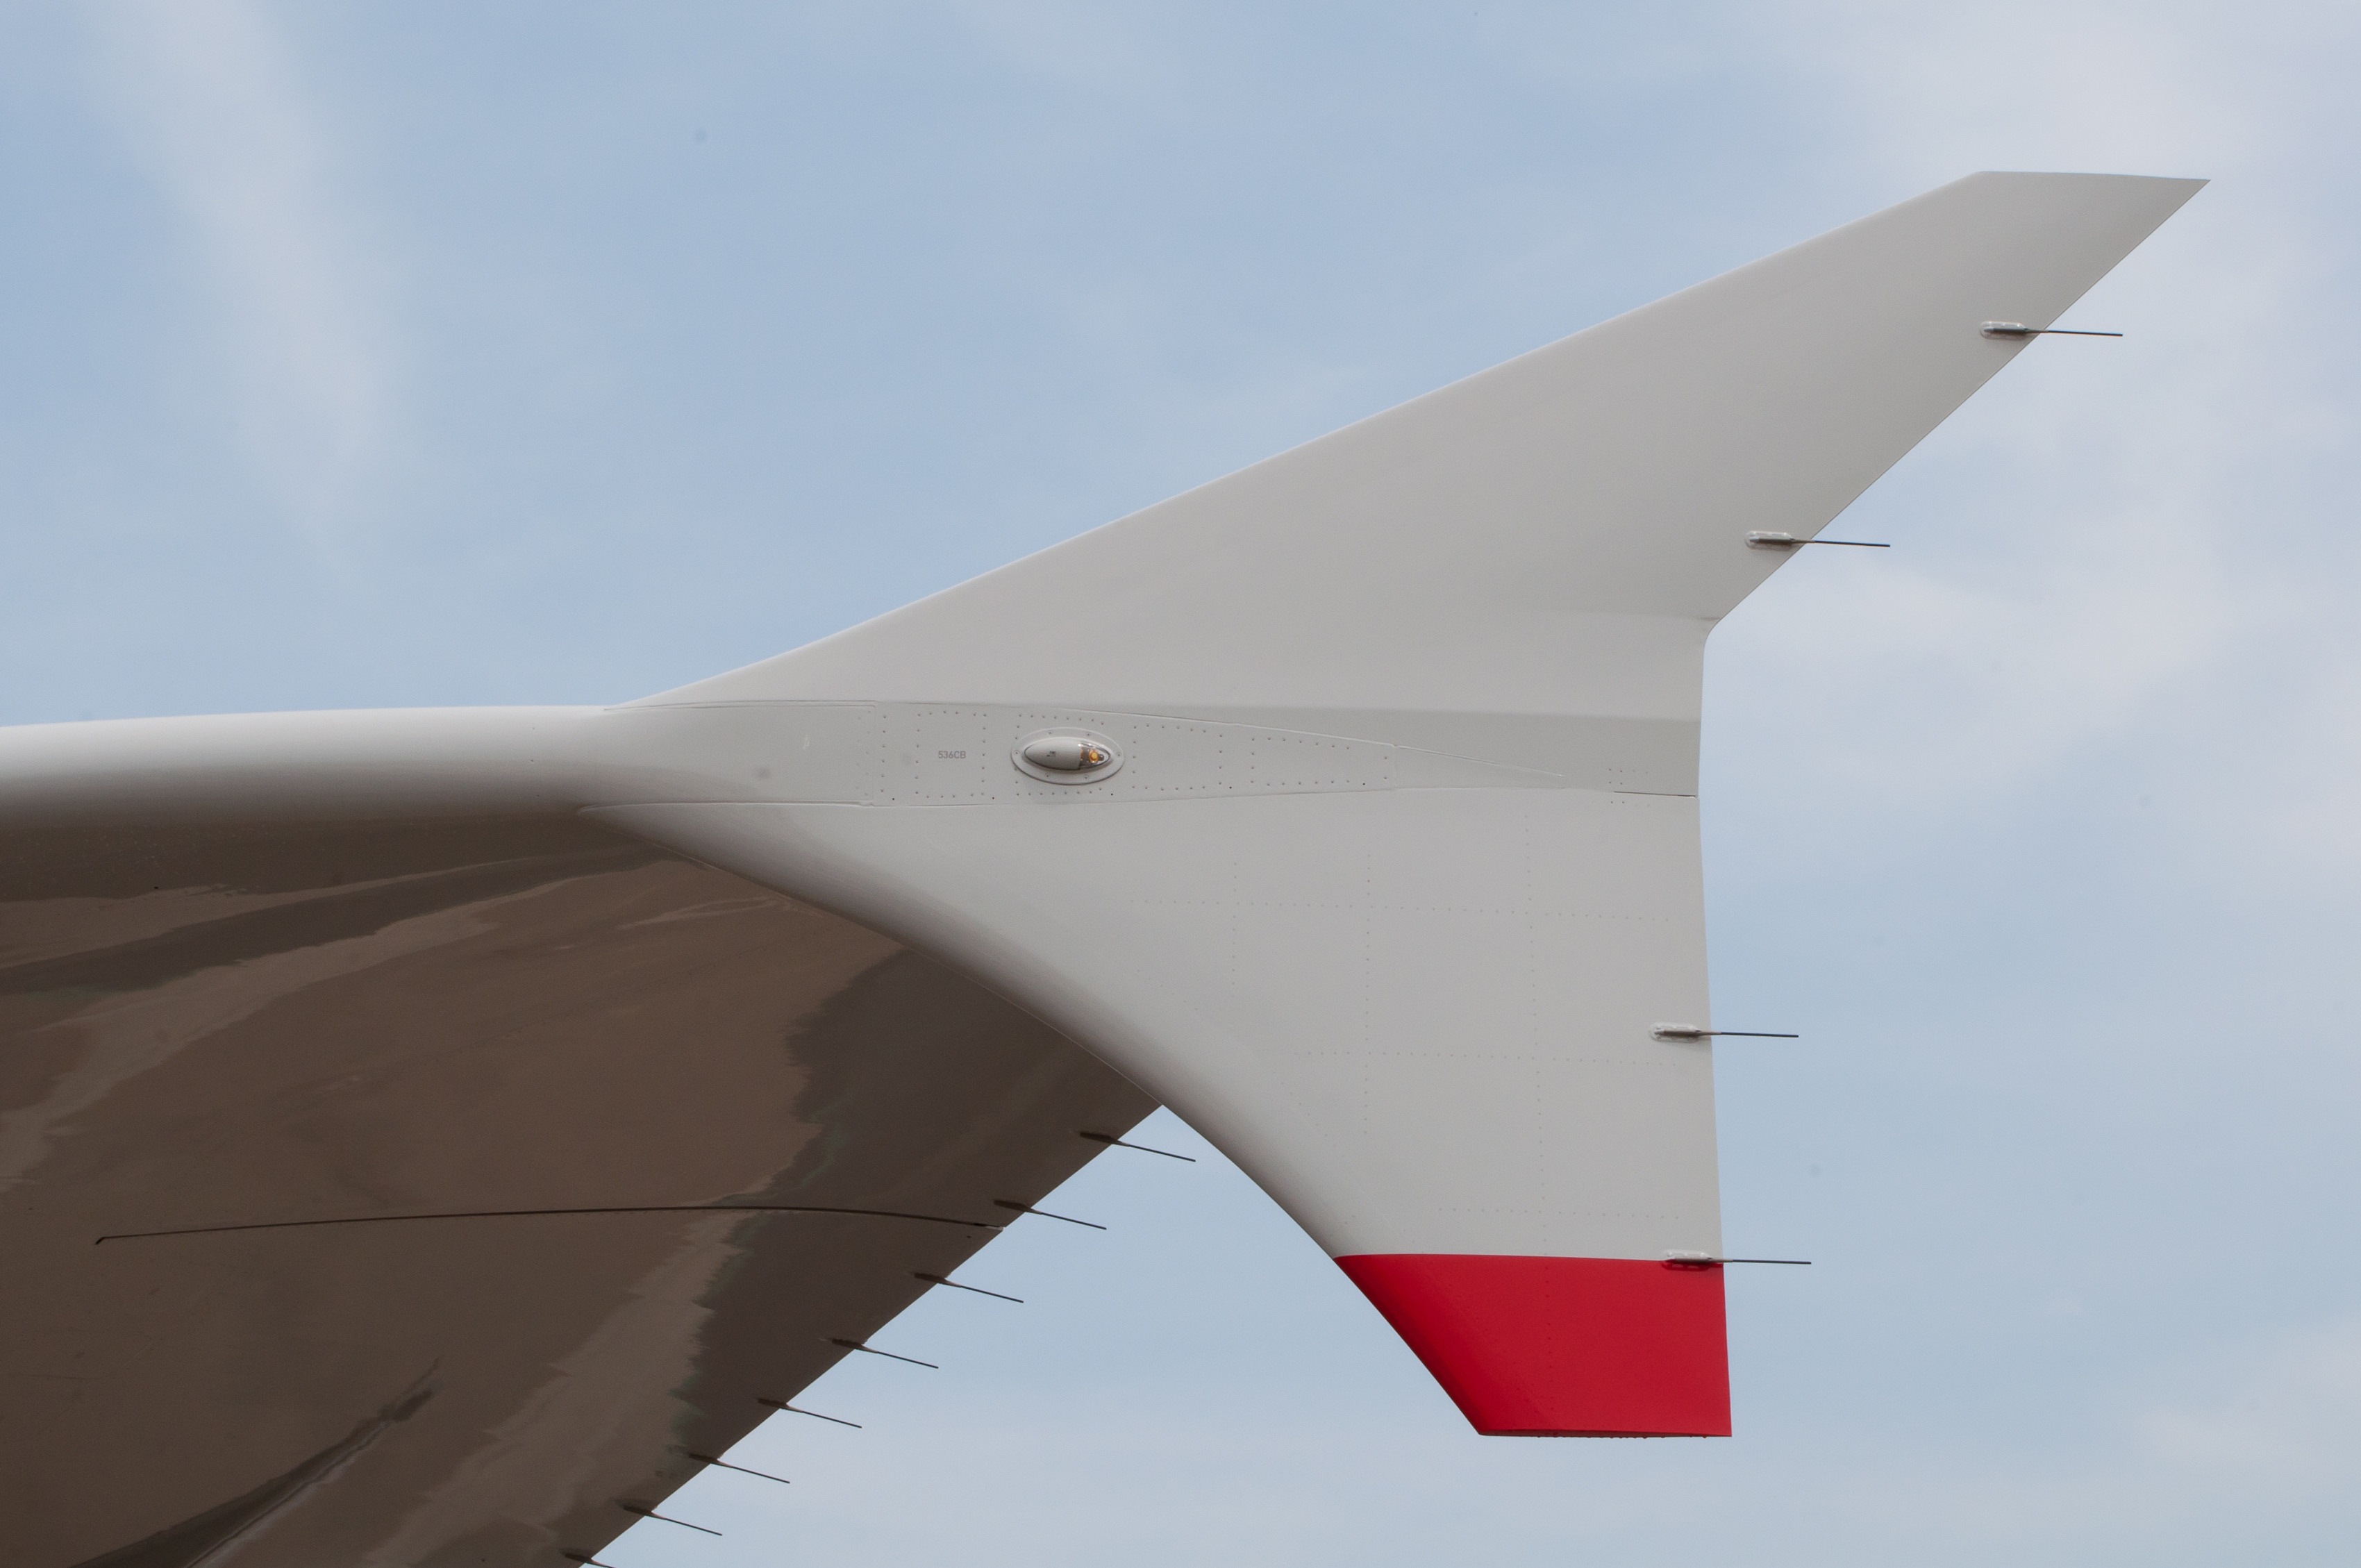 File:British Airways Airbus A380-841 F-WWSK PAS 2013 10 Wingtip device ...